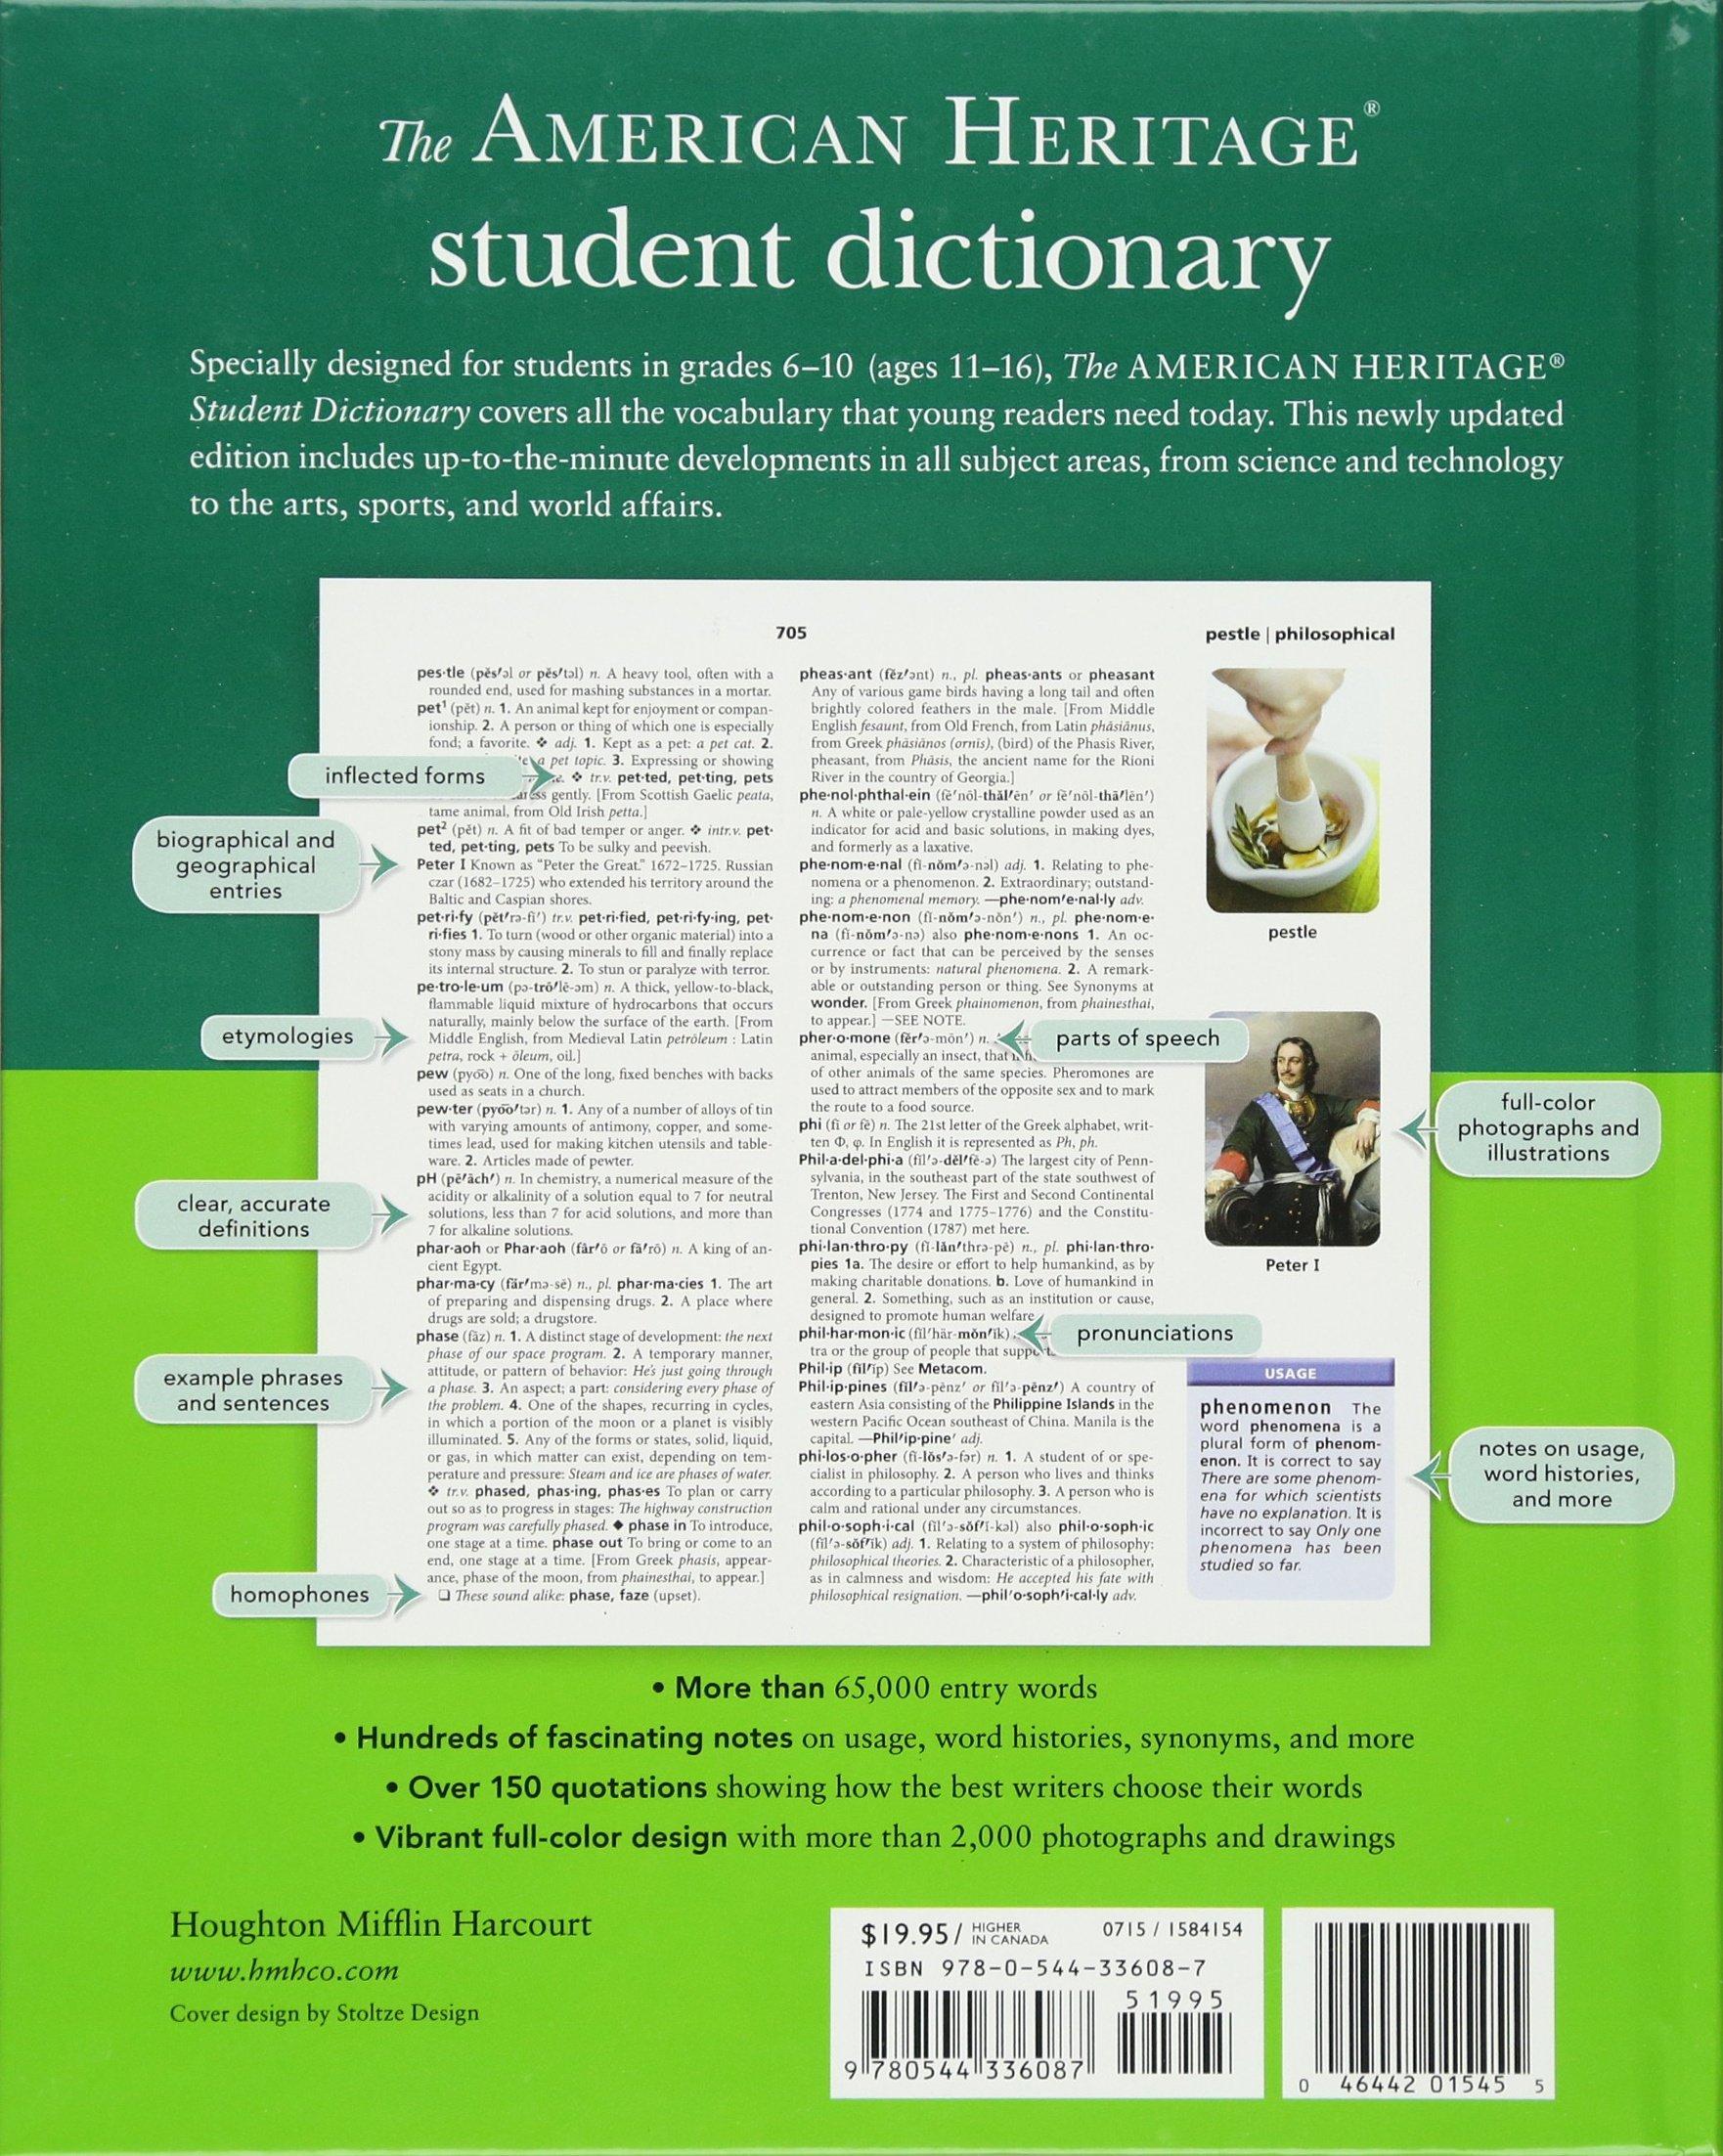 amazoncom the american heritage student dictionary 9780544336087 editors of the american heritage dictionaries books